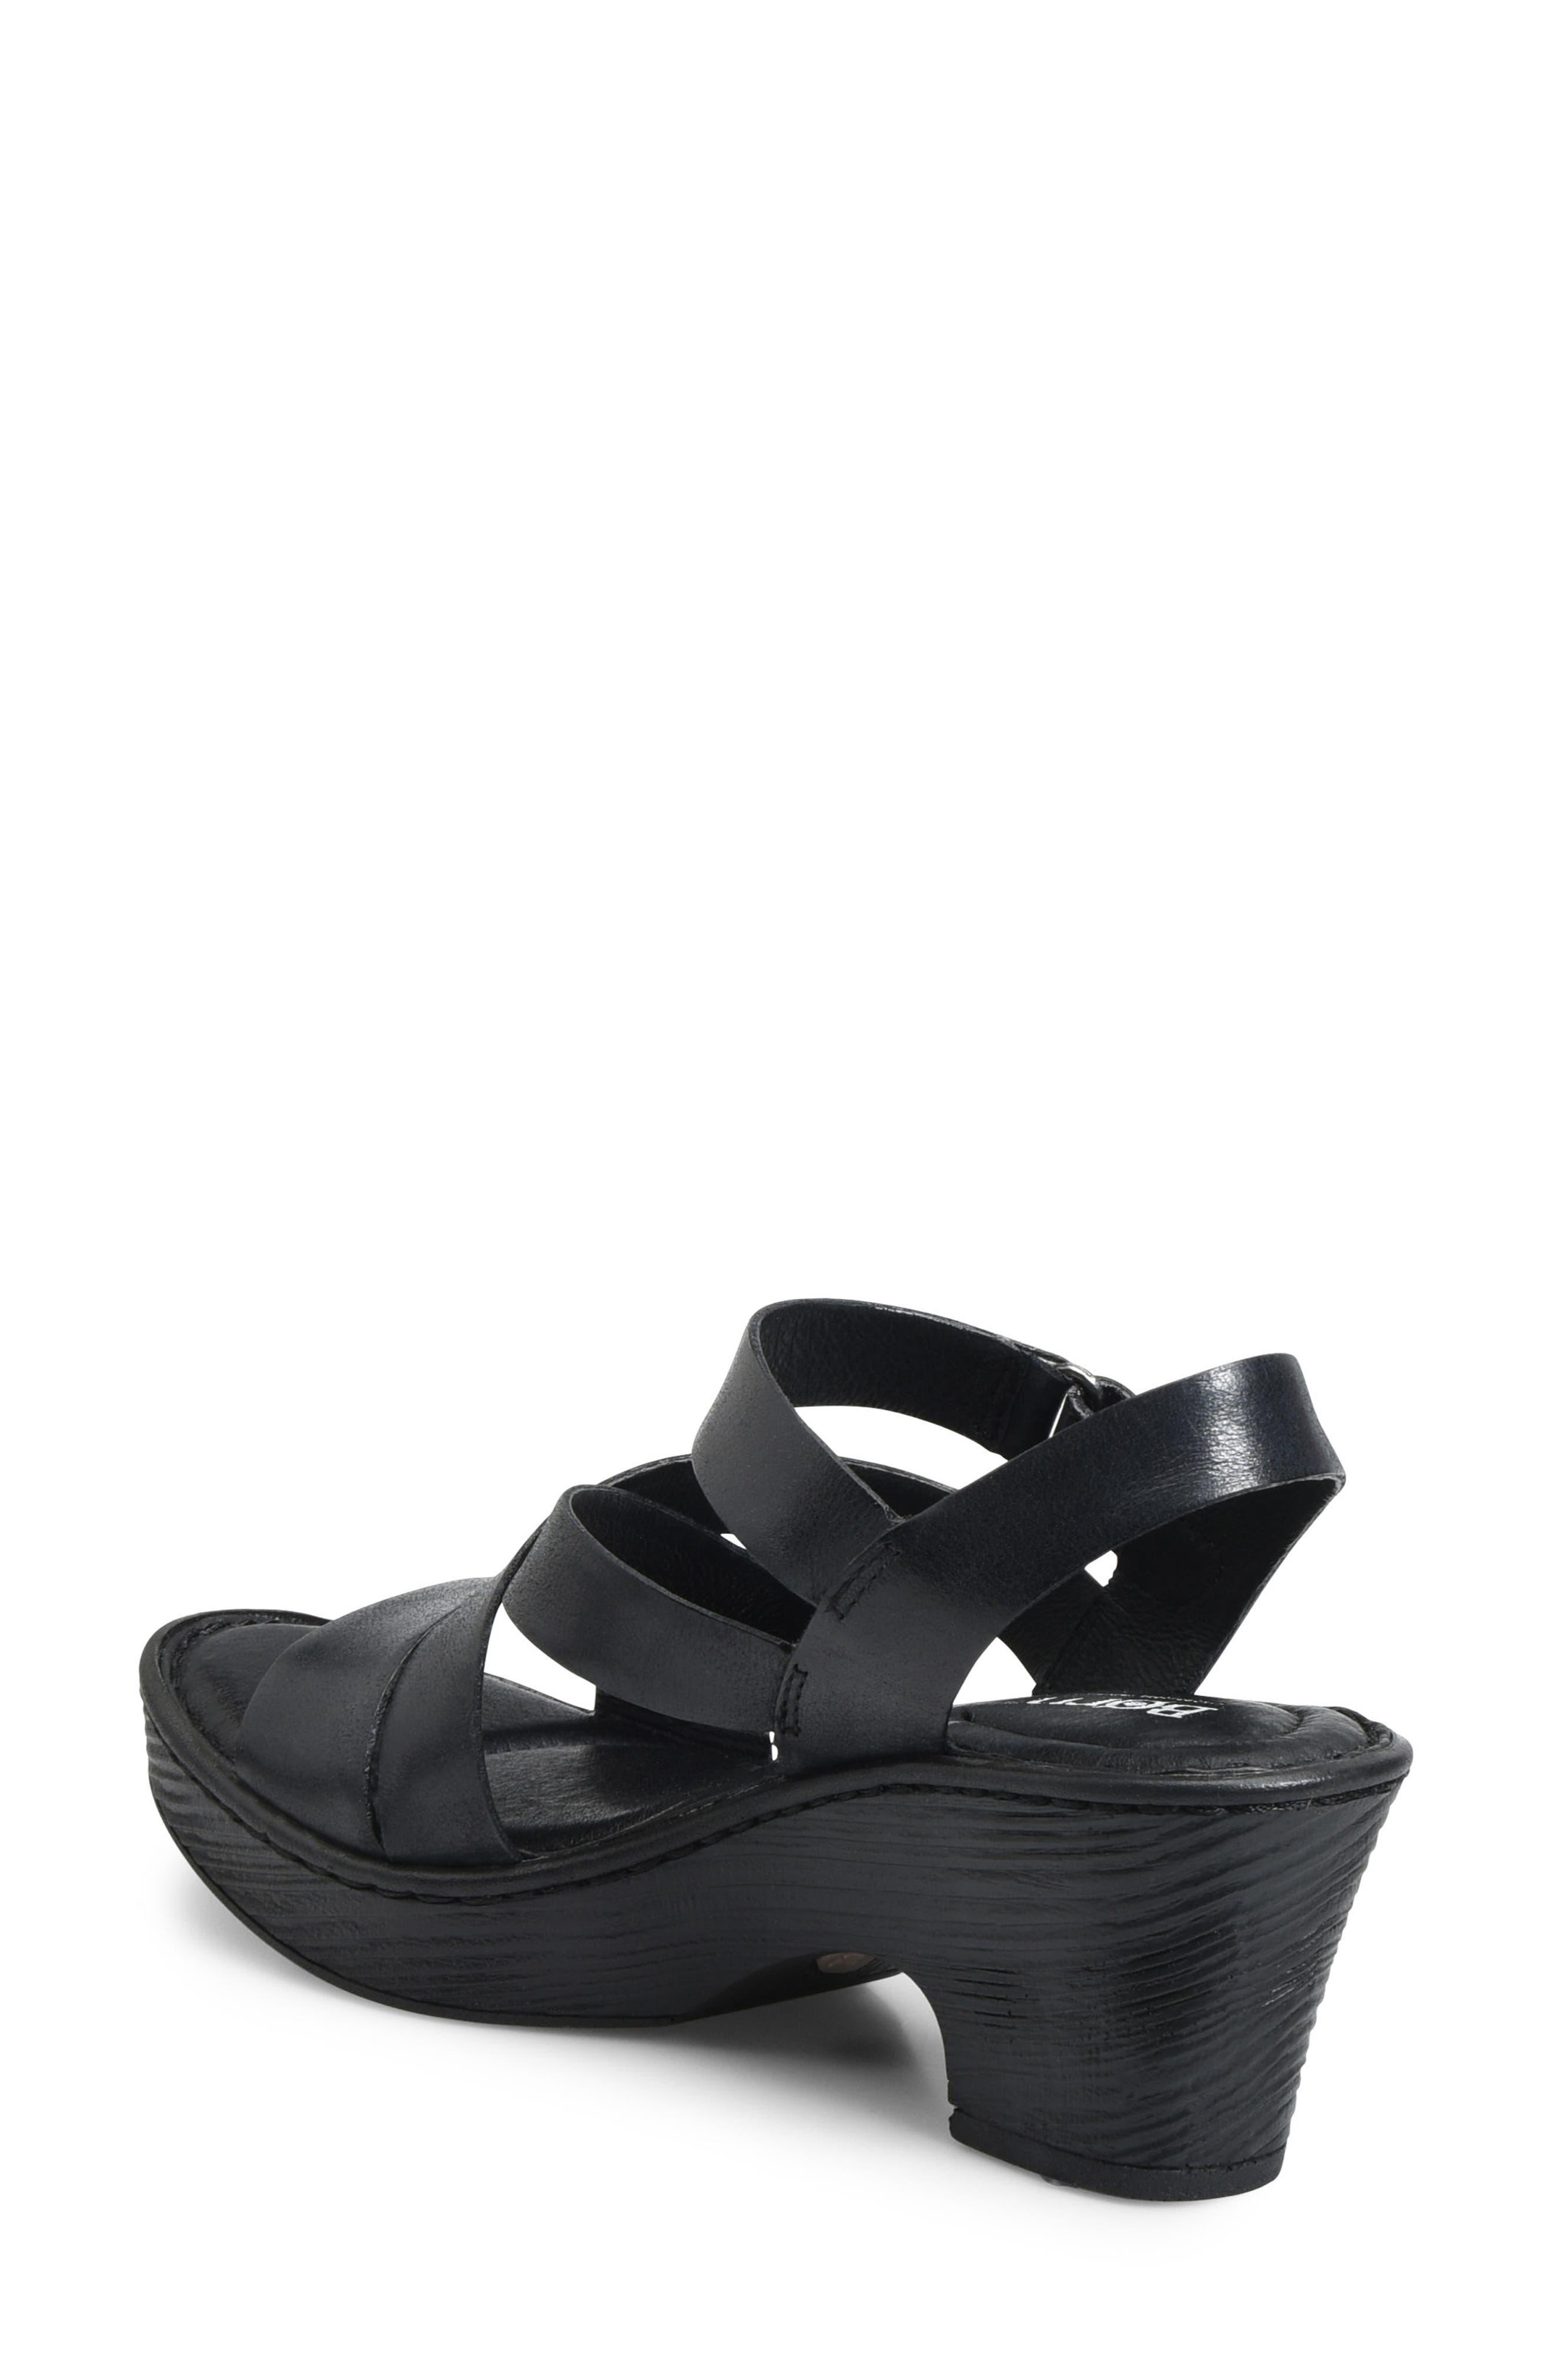 Cubera Platform Sandal,                             Alternate thumbnail 2, color,                             001